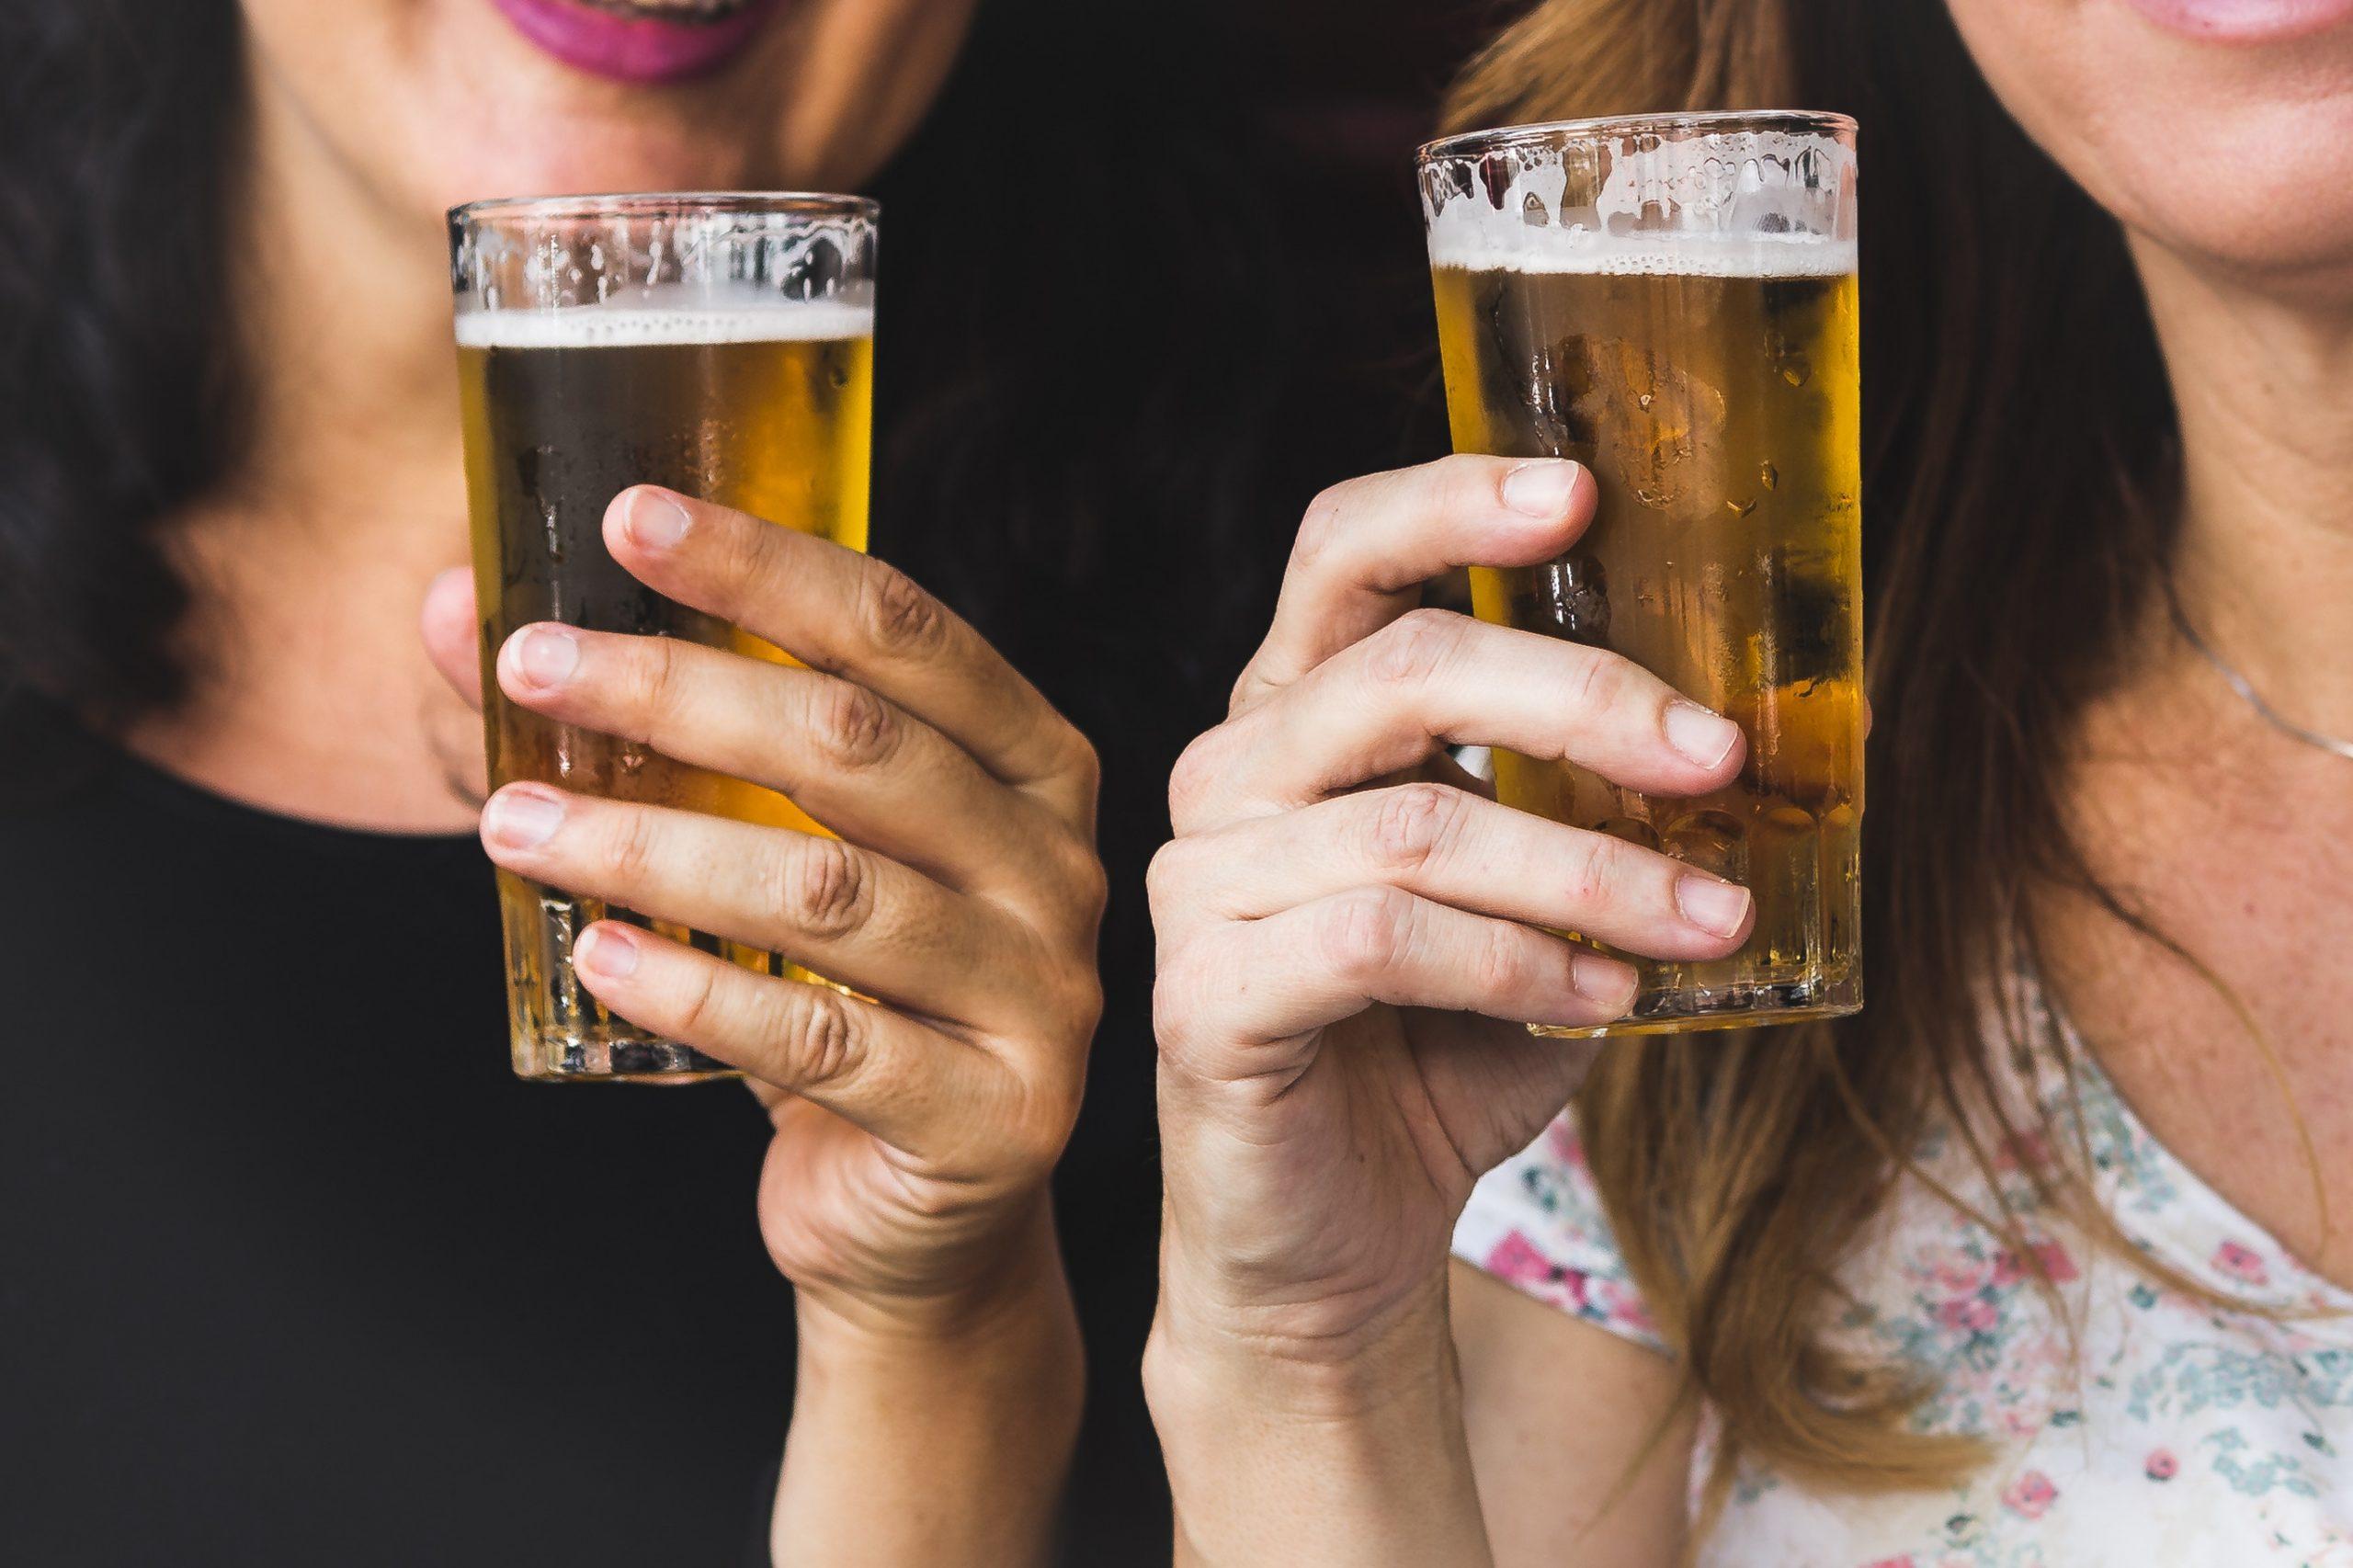 cata de cervezas despedida de soltera